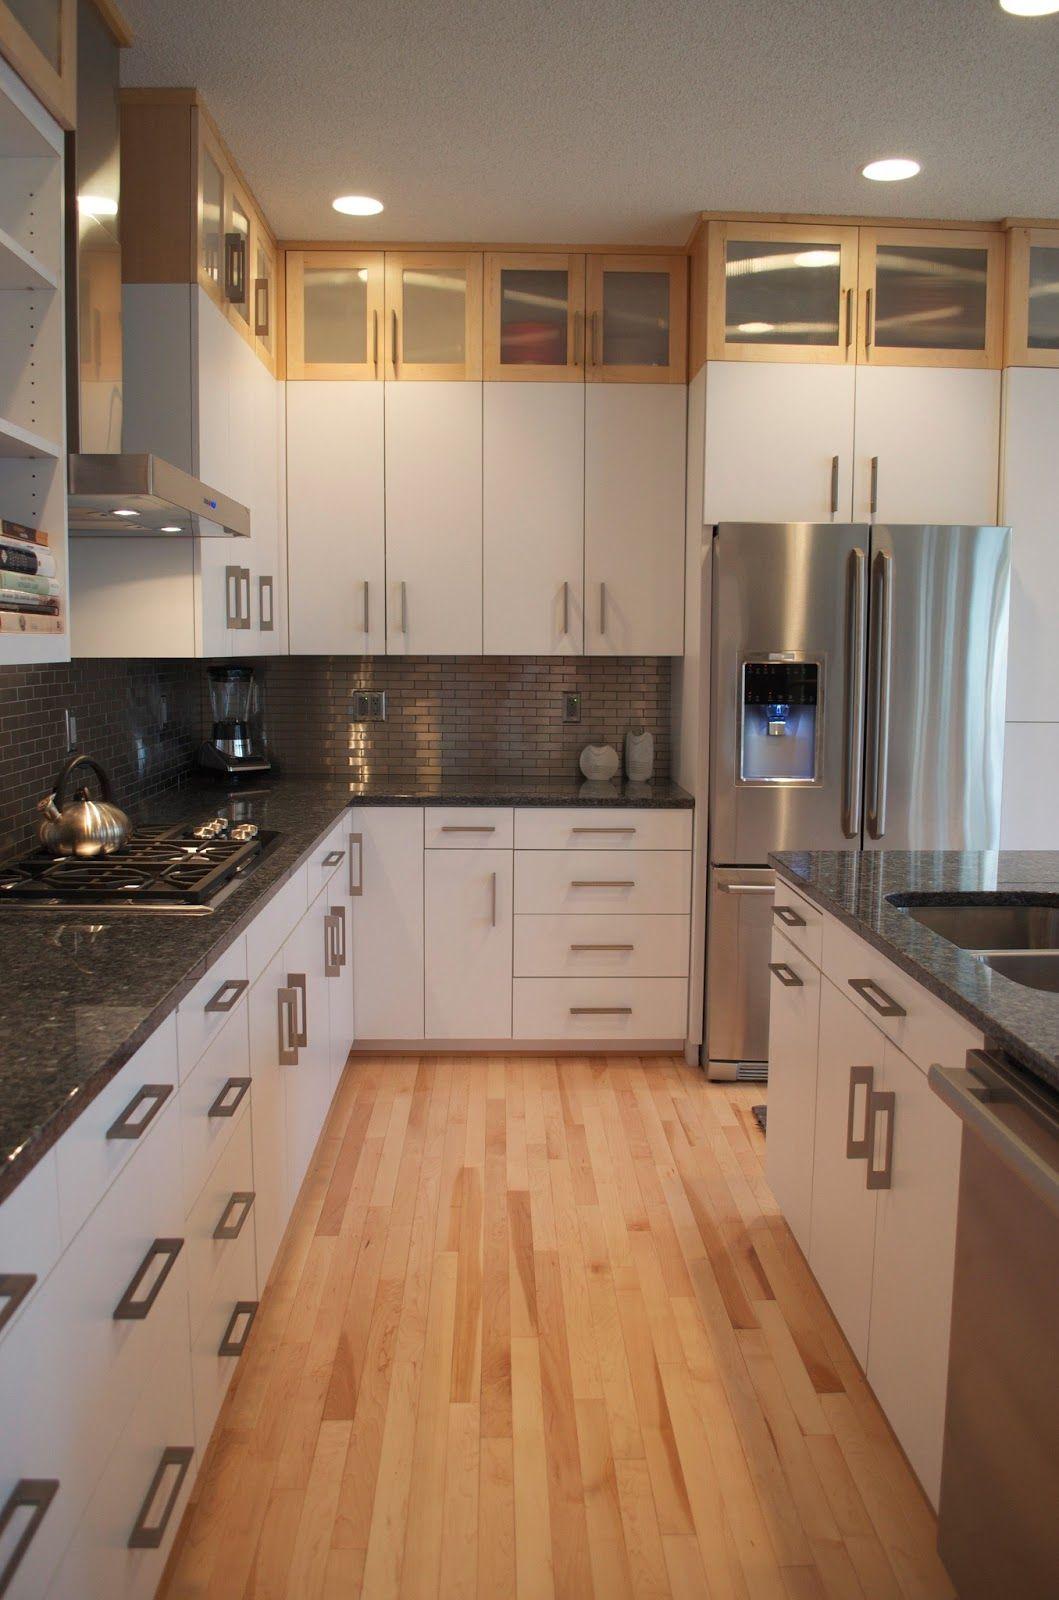 White Cabinets Grey Countertops Kitchen Cabinets Clean Kitchen Cabinets Laminate Flooring In Kitchen